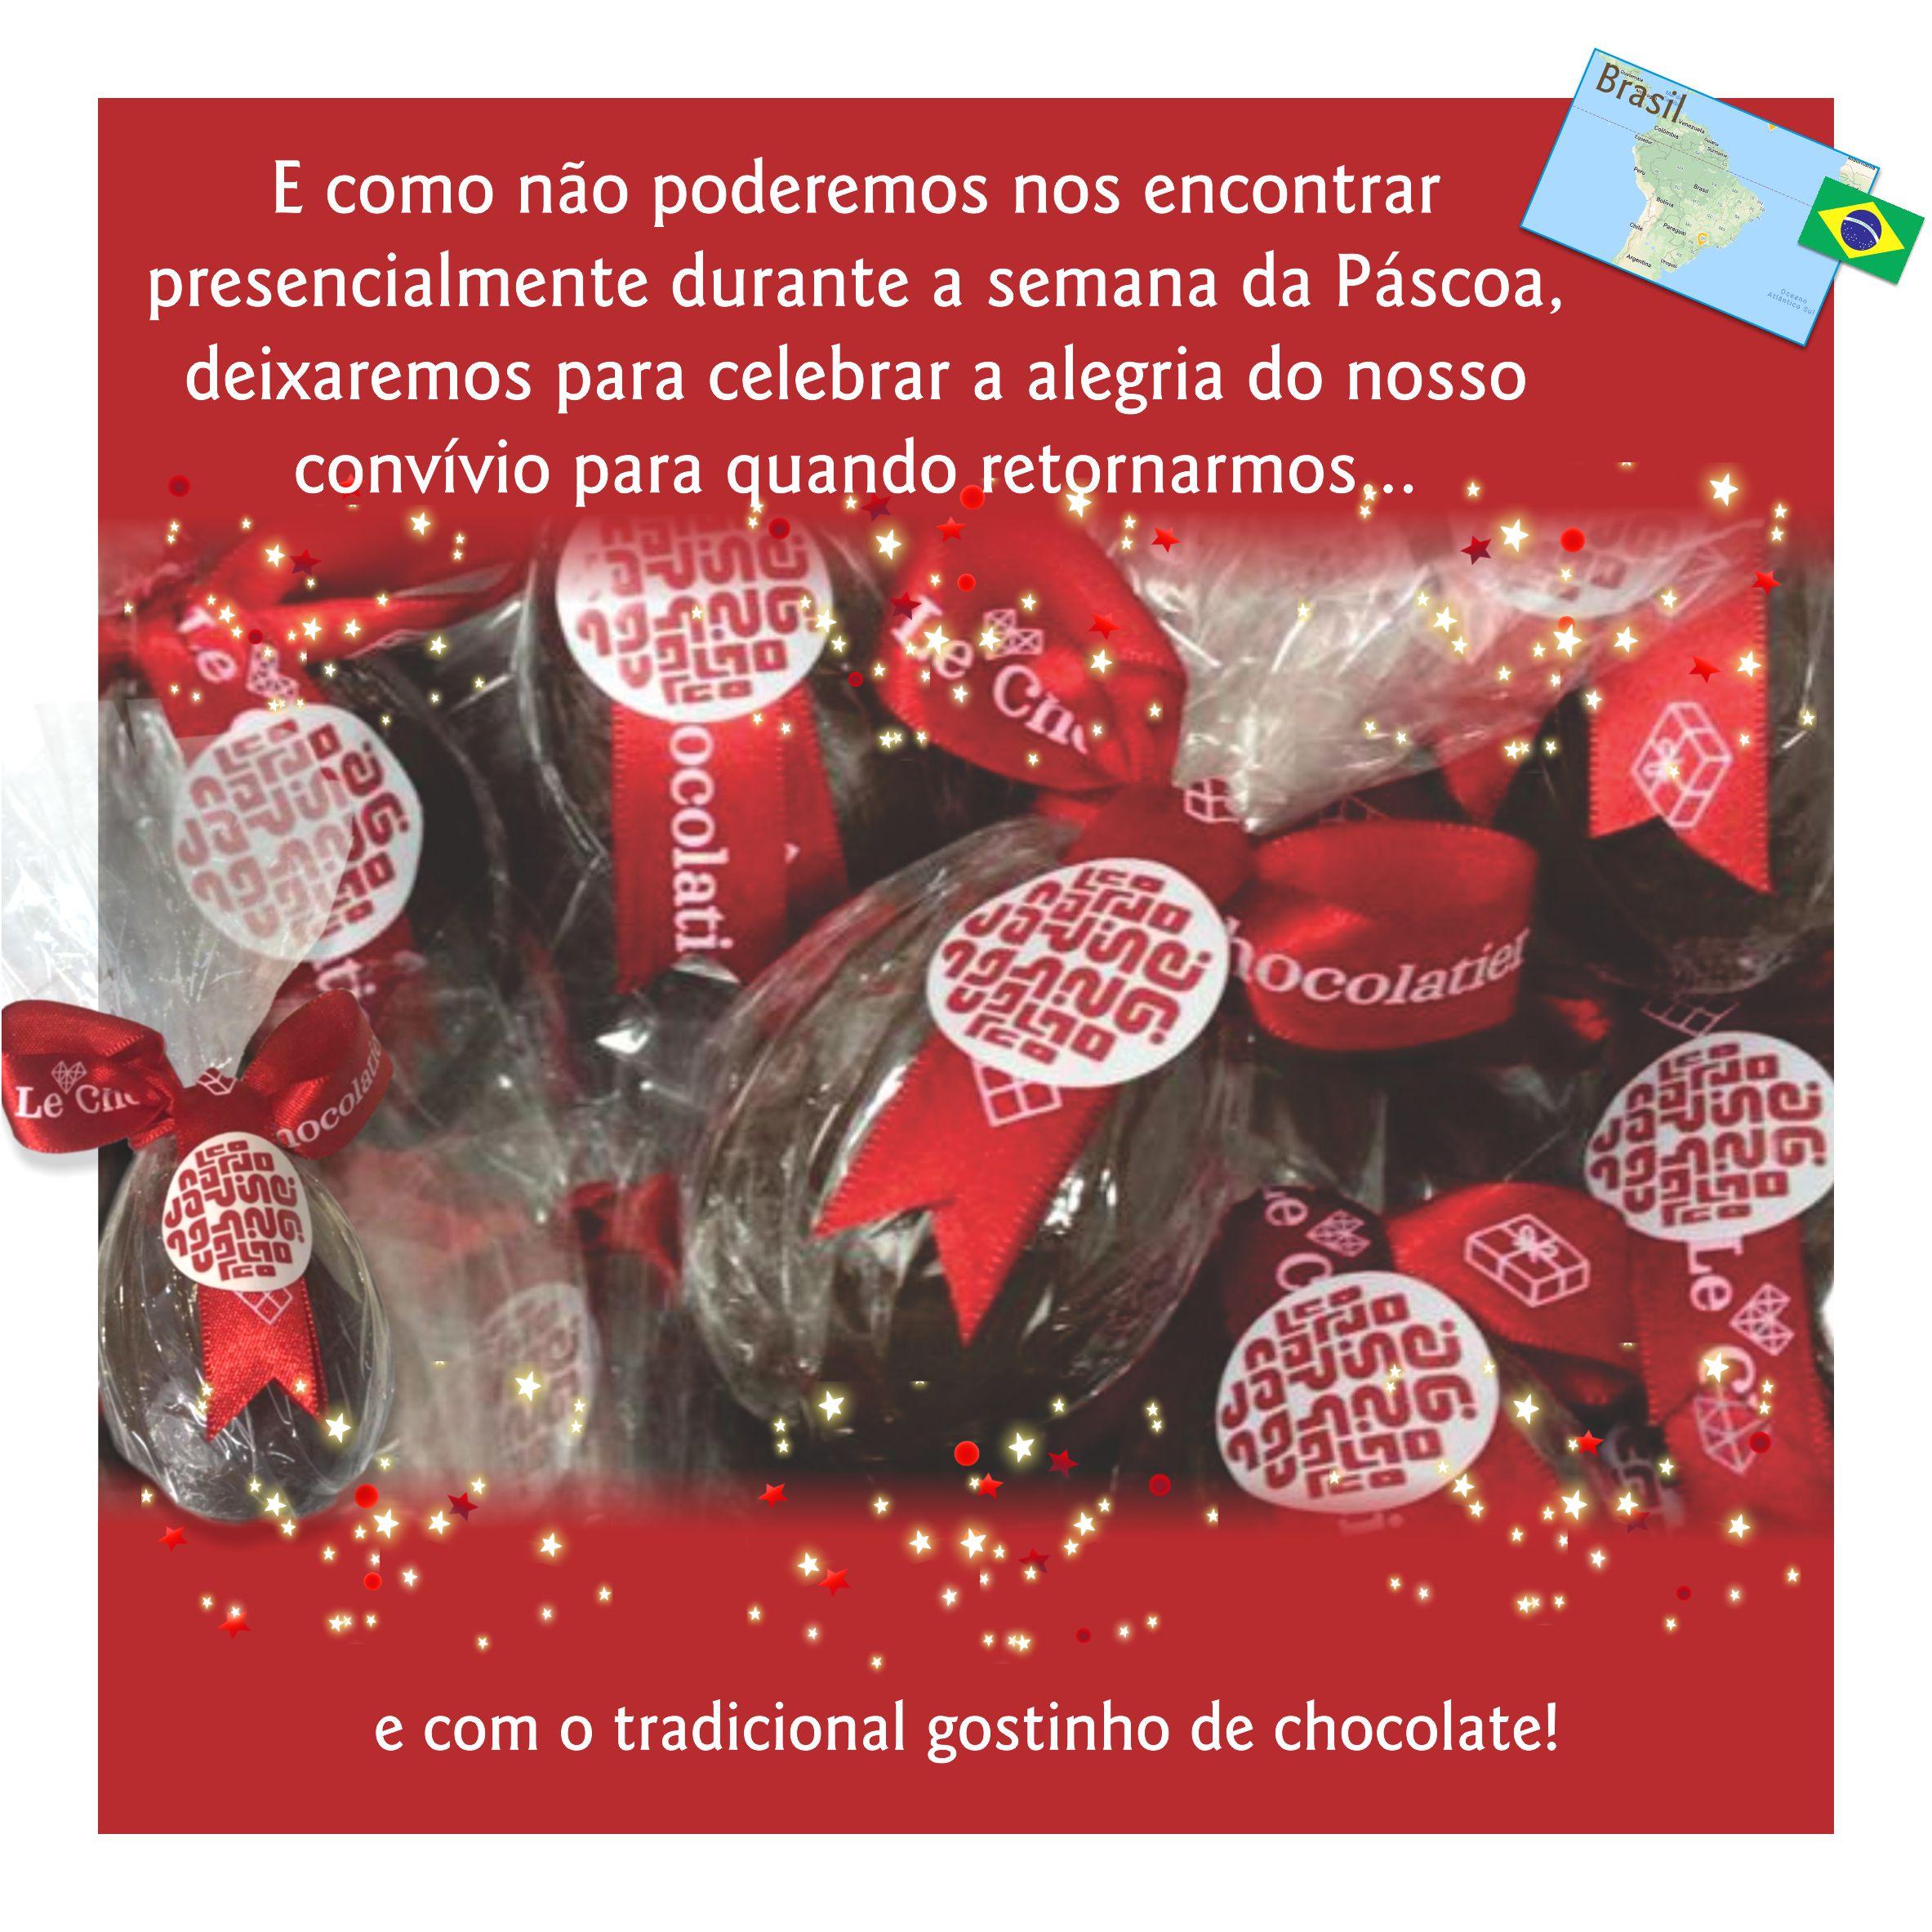 ovinhos chocolatier 09 04